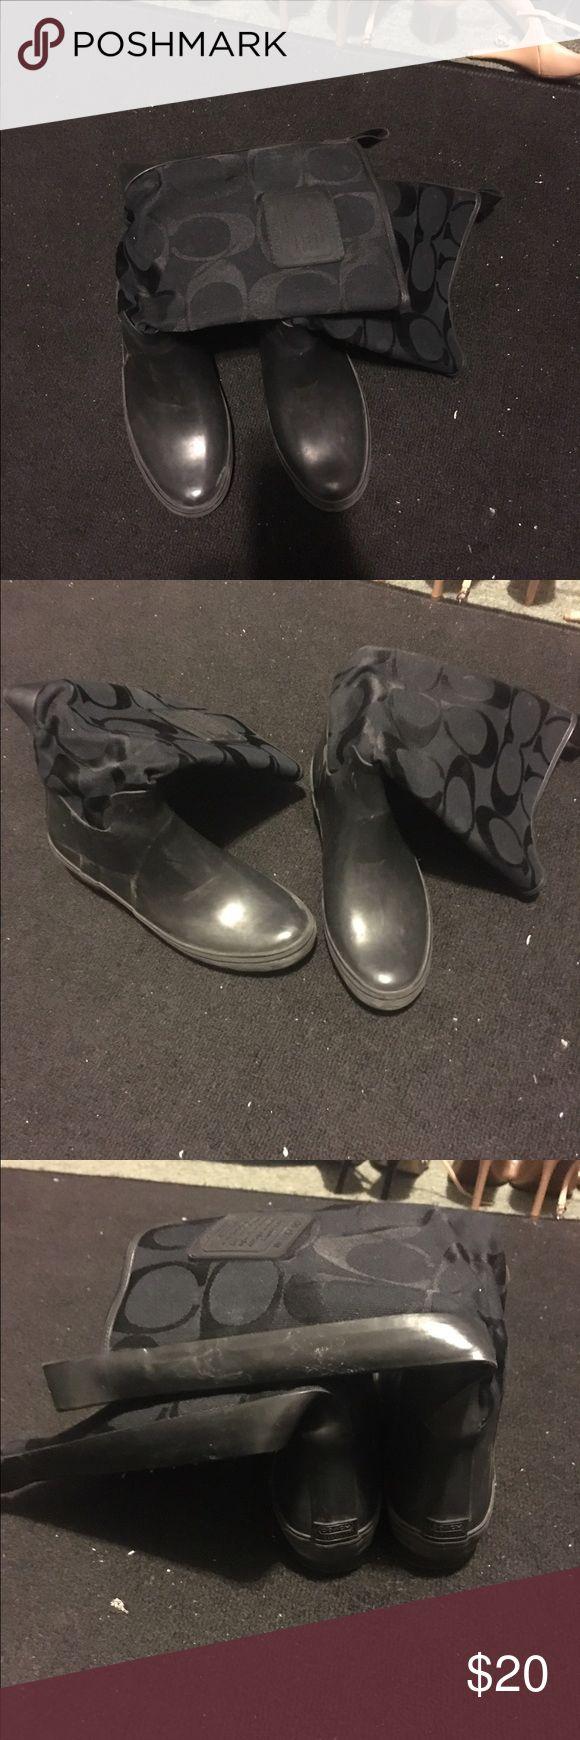 Coach rain boots Black rain boot - good condition Coach Shoes Winter & Rain Boots